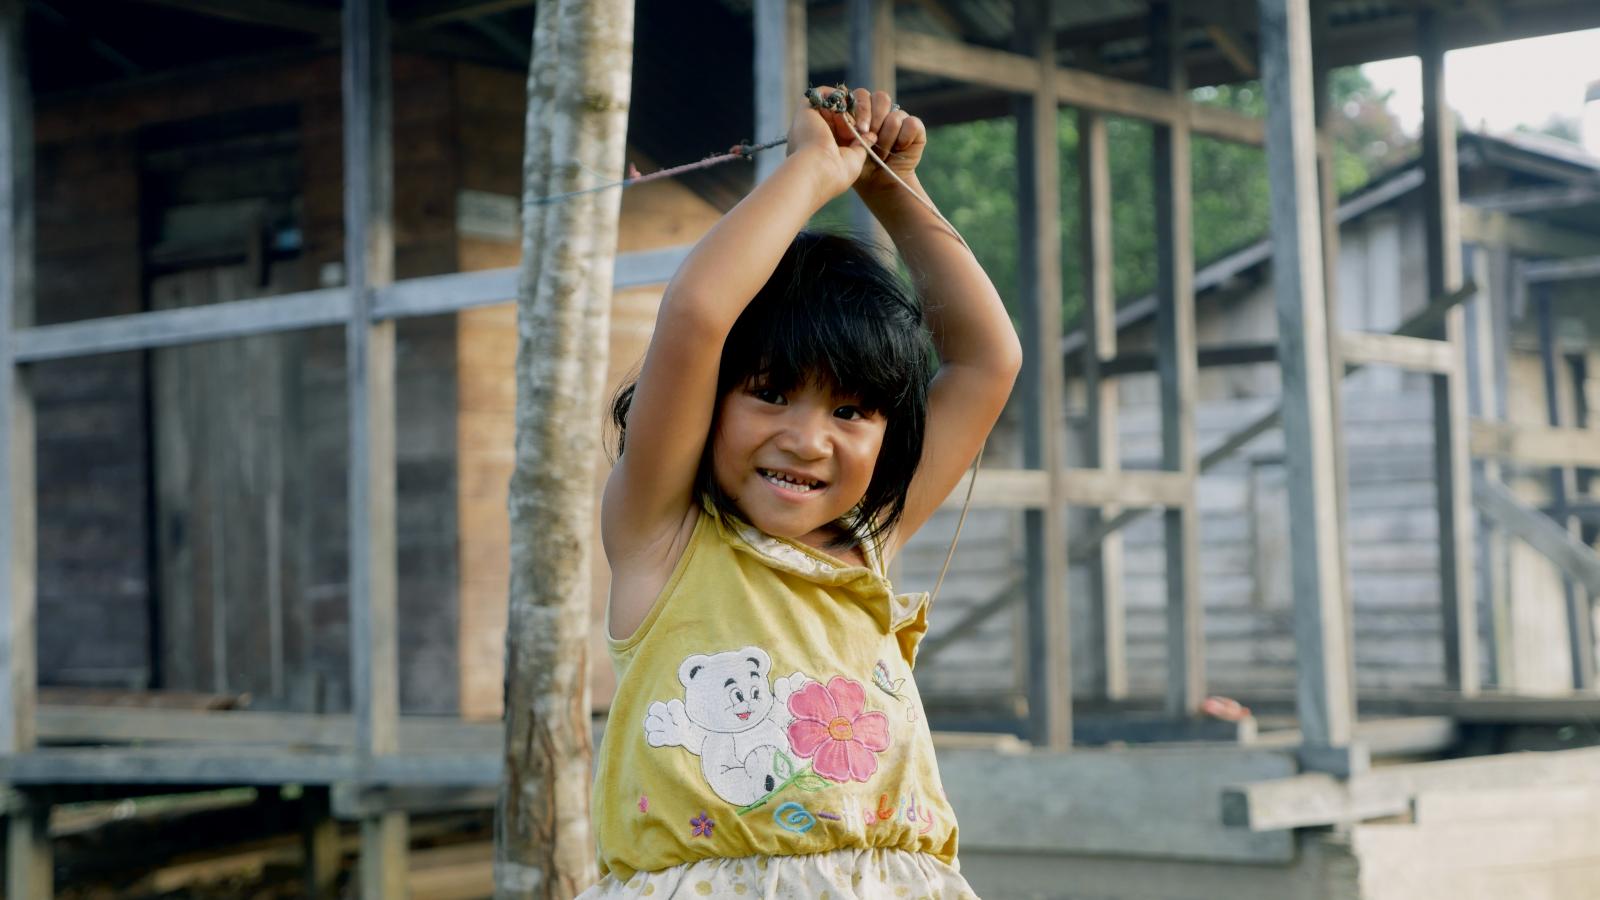 Indonesia (Ecosia)